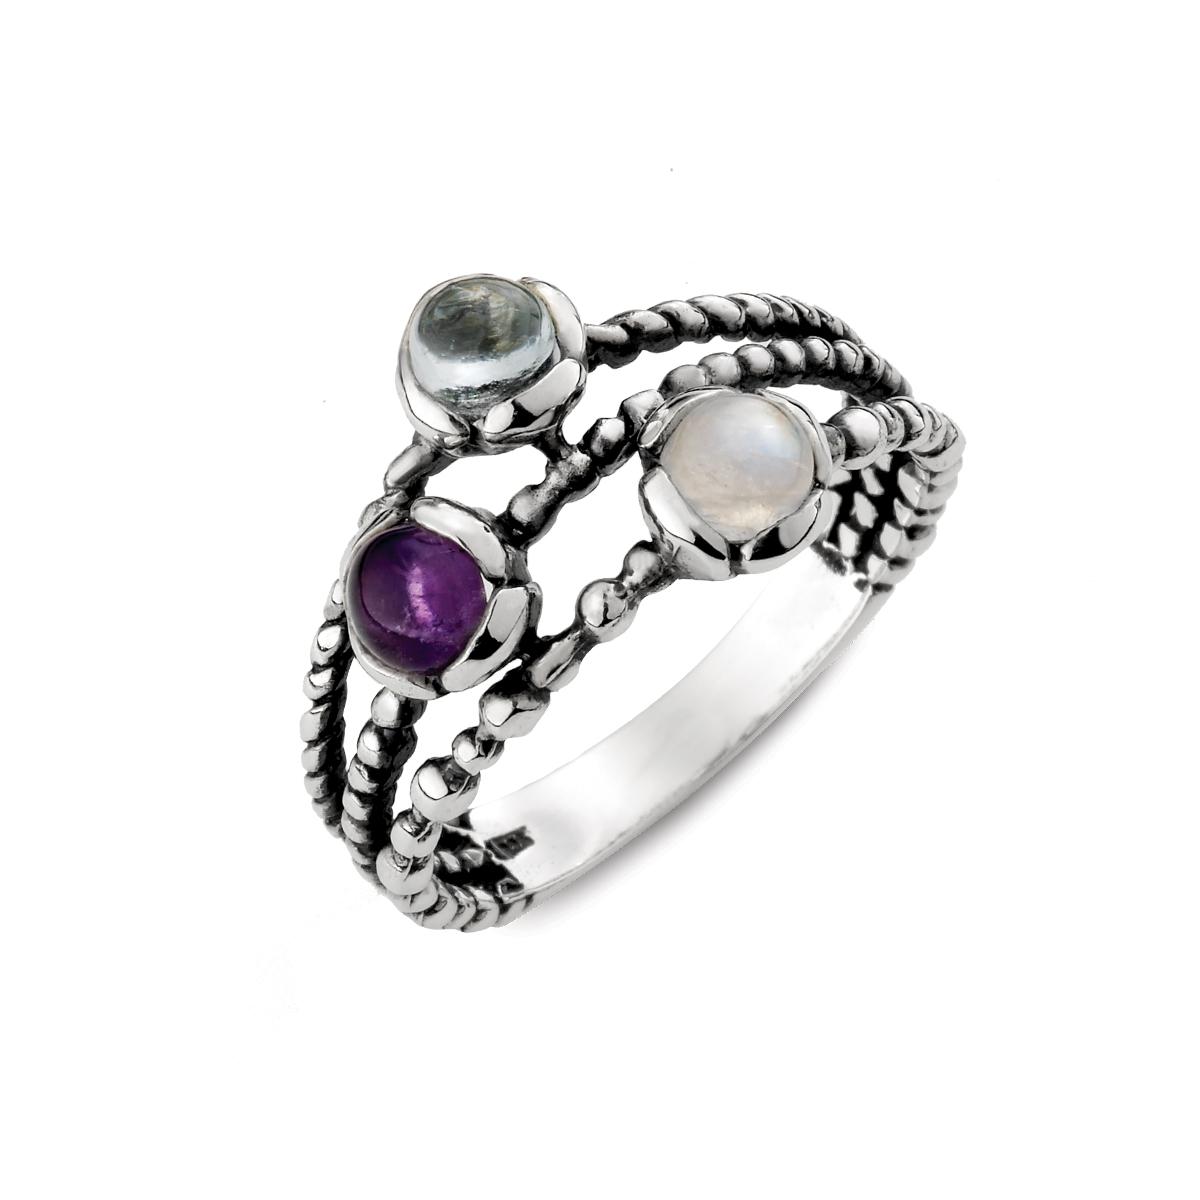 KSW318 天然石精靈個性麻繩戒指